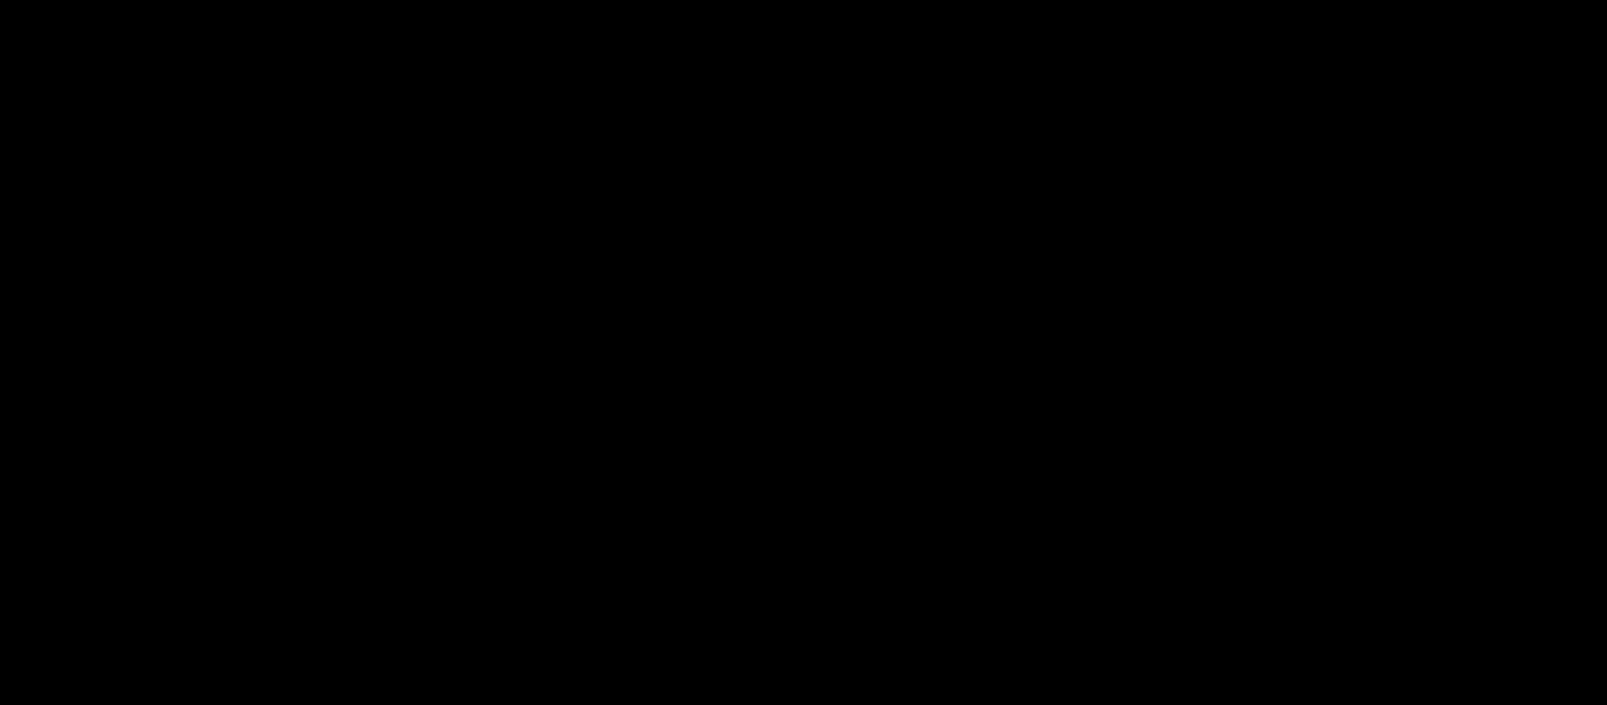 GELU formula